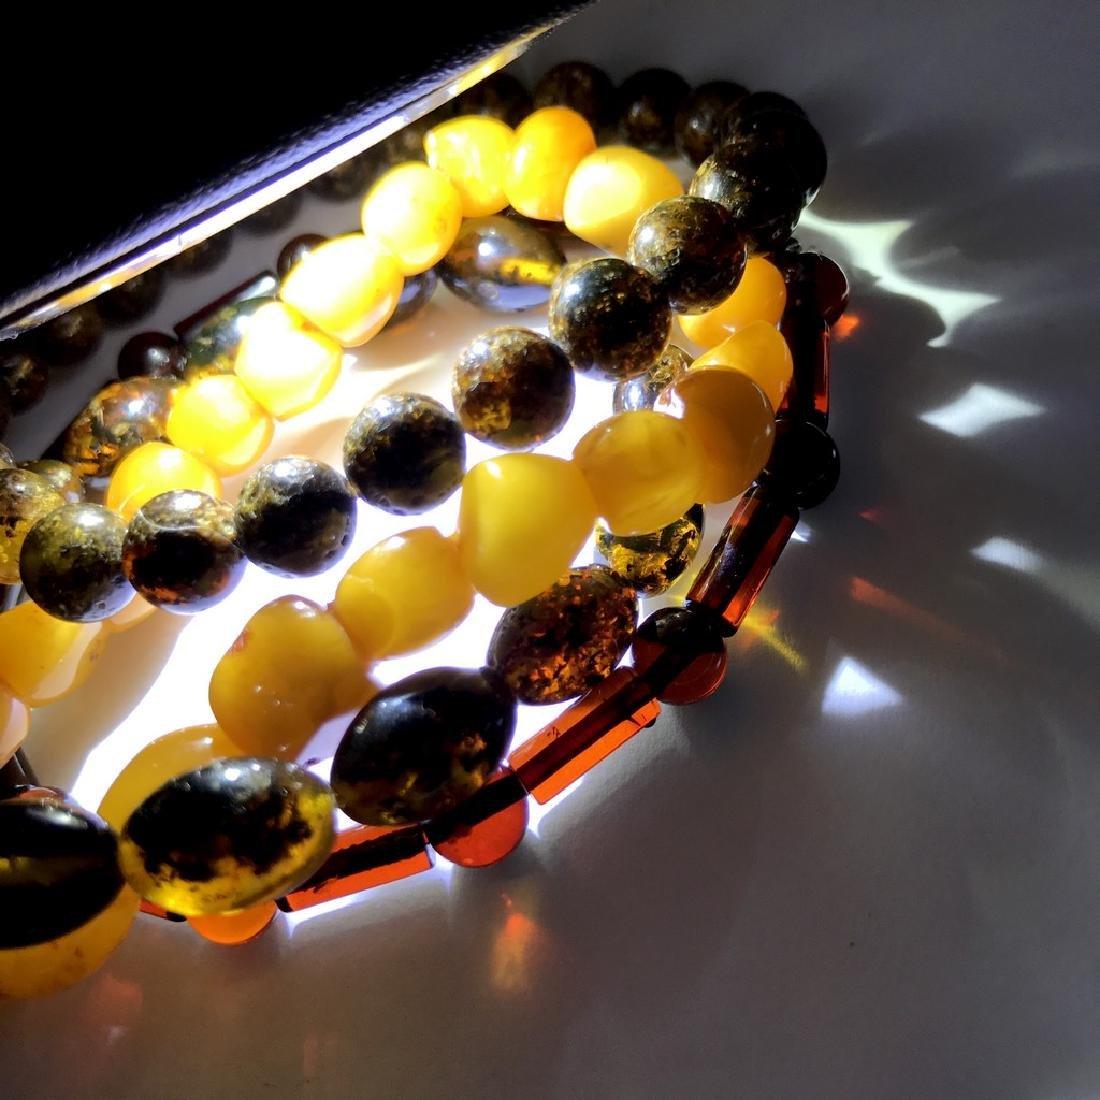 Baltic amber 4x bracelets various colours beads 25 gr - 6